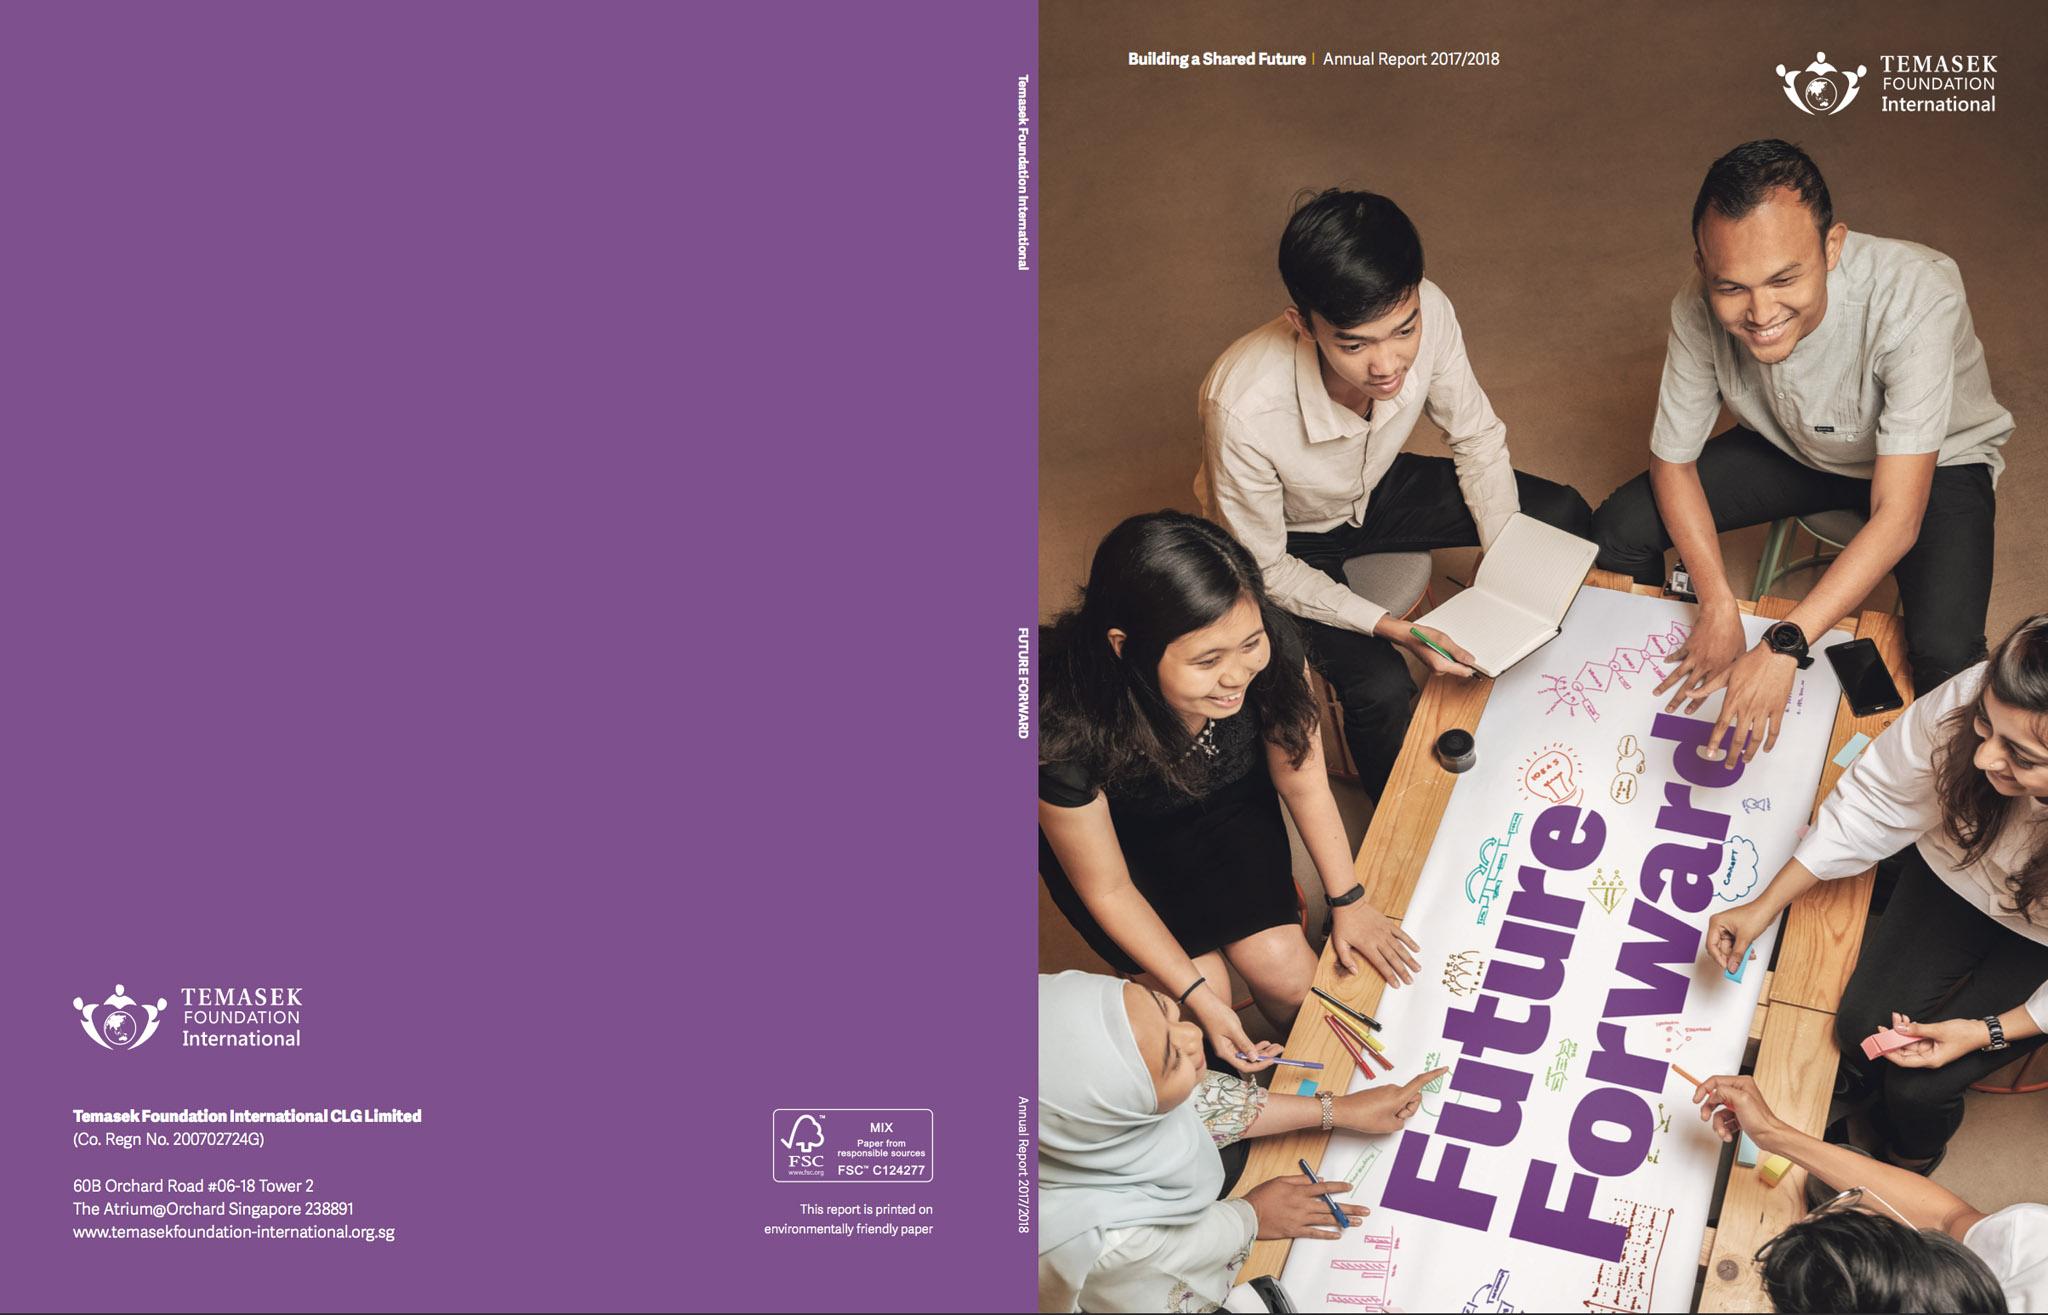 001-001TFI-AR-2018-Cover-singapore-photographer-editorial-commercial-1.jpg